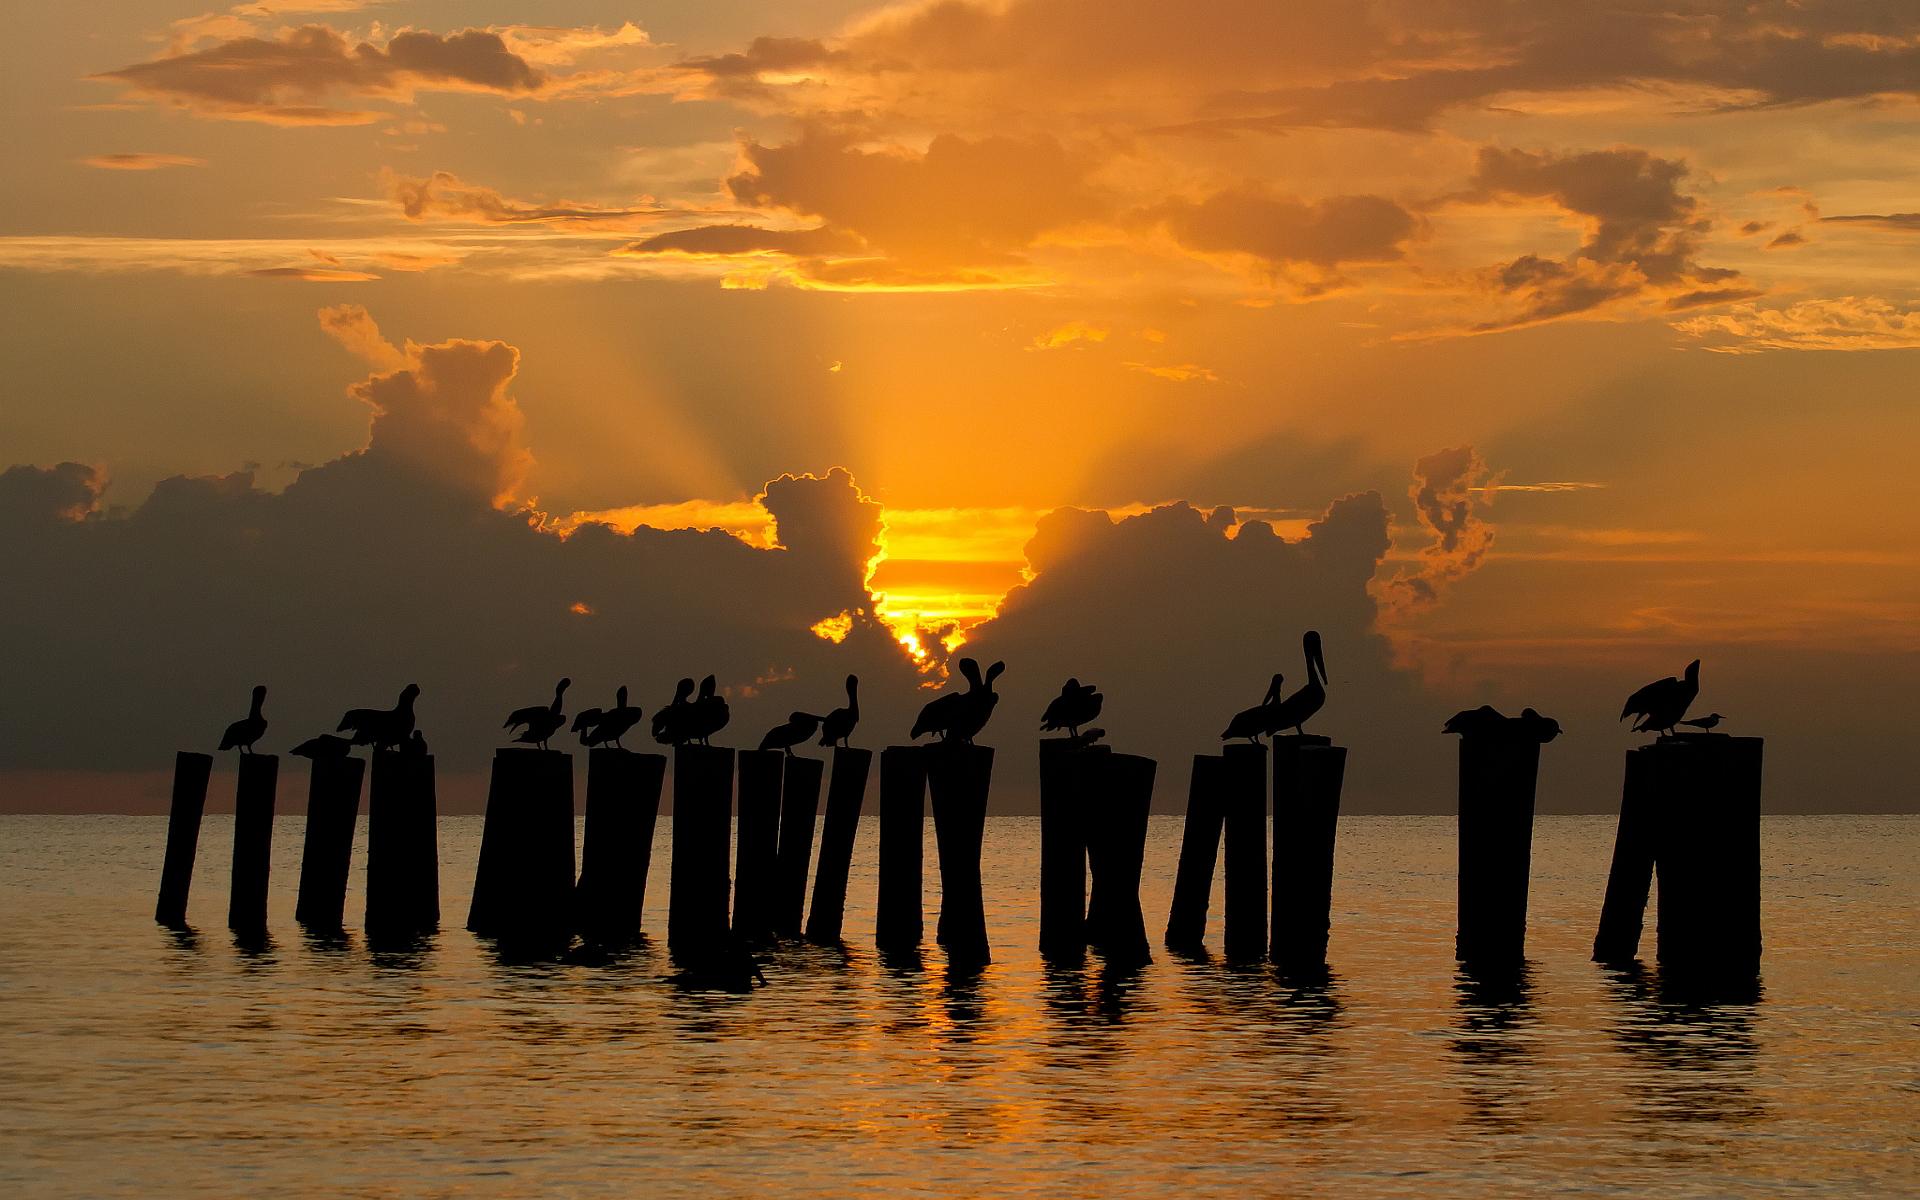 Pelicans in sunset